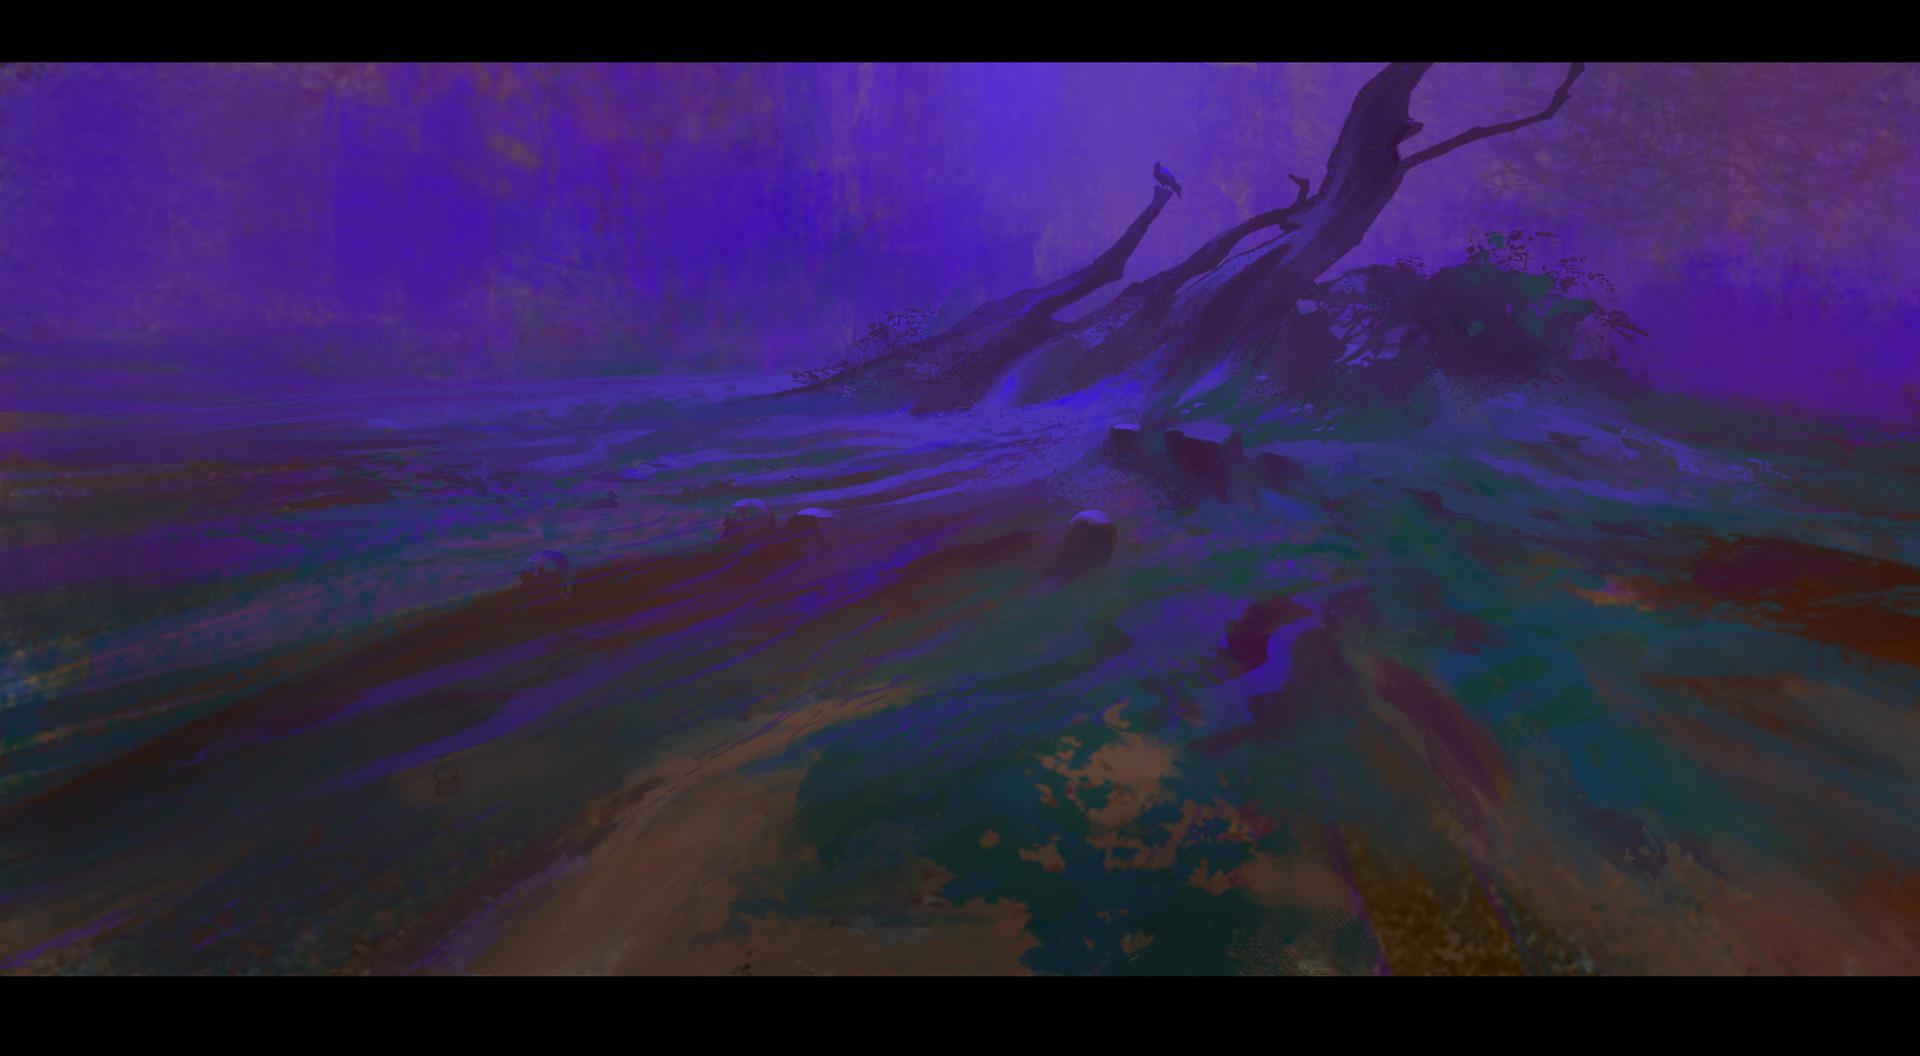 Sathish kumar color experiment 01